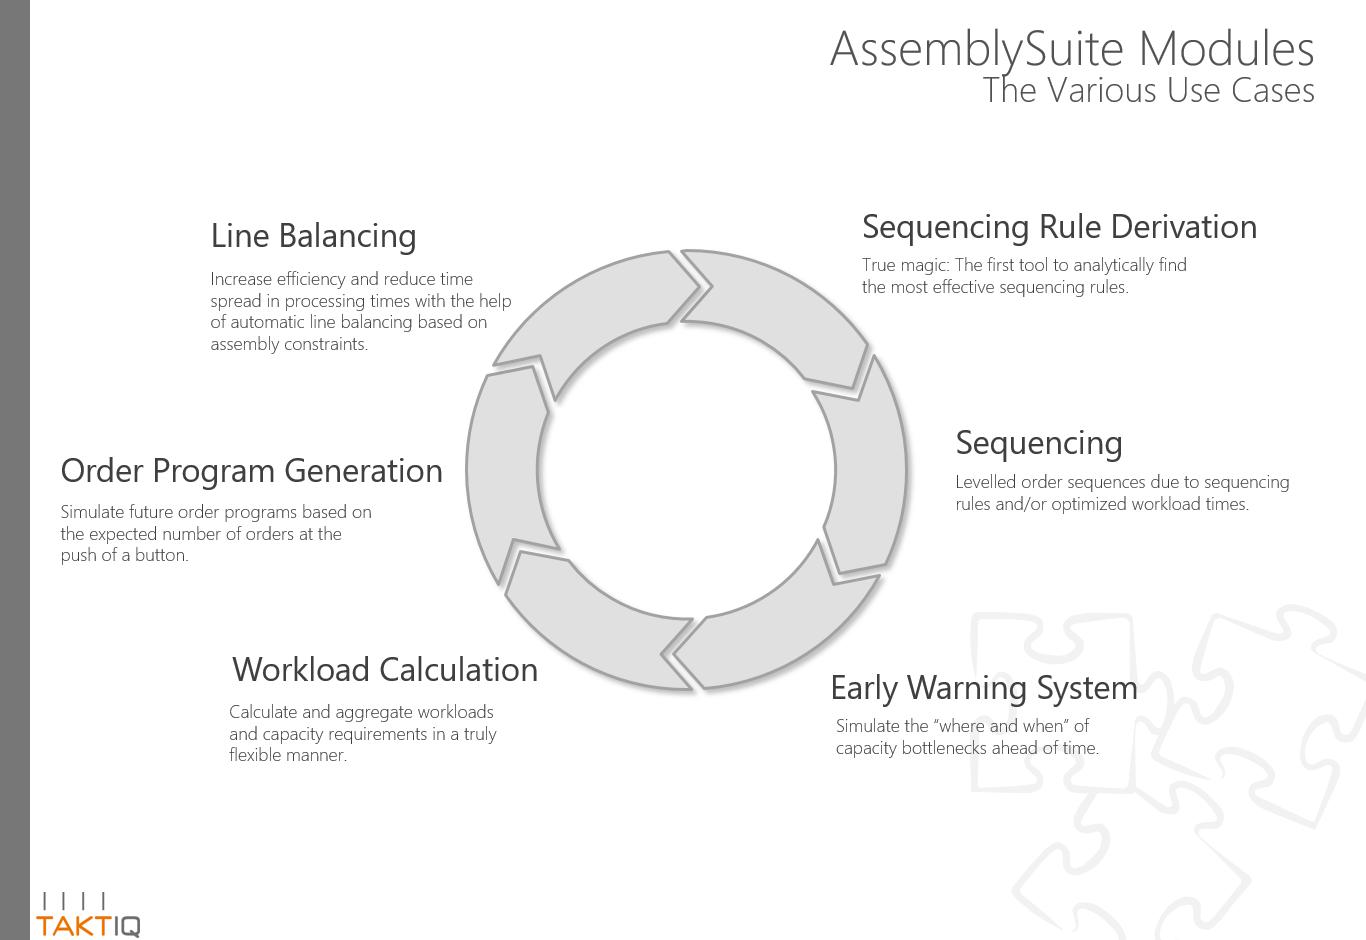 Picture: AssemblySuite Modules